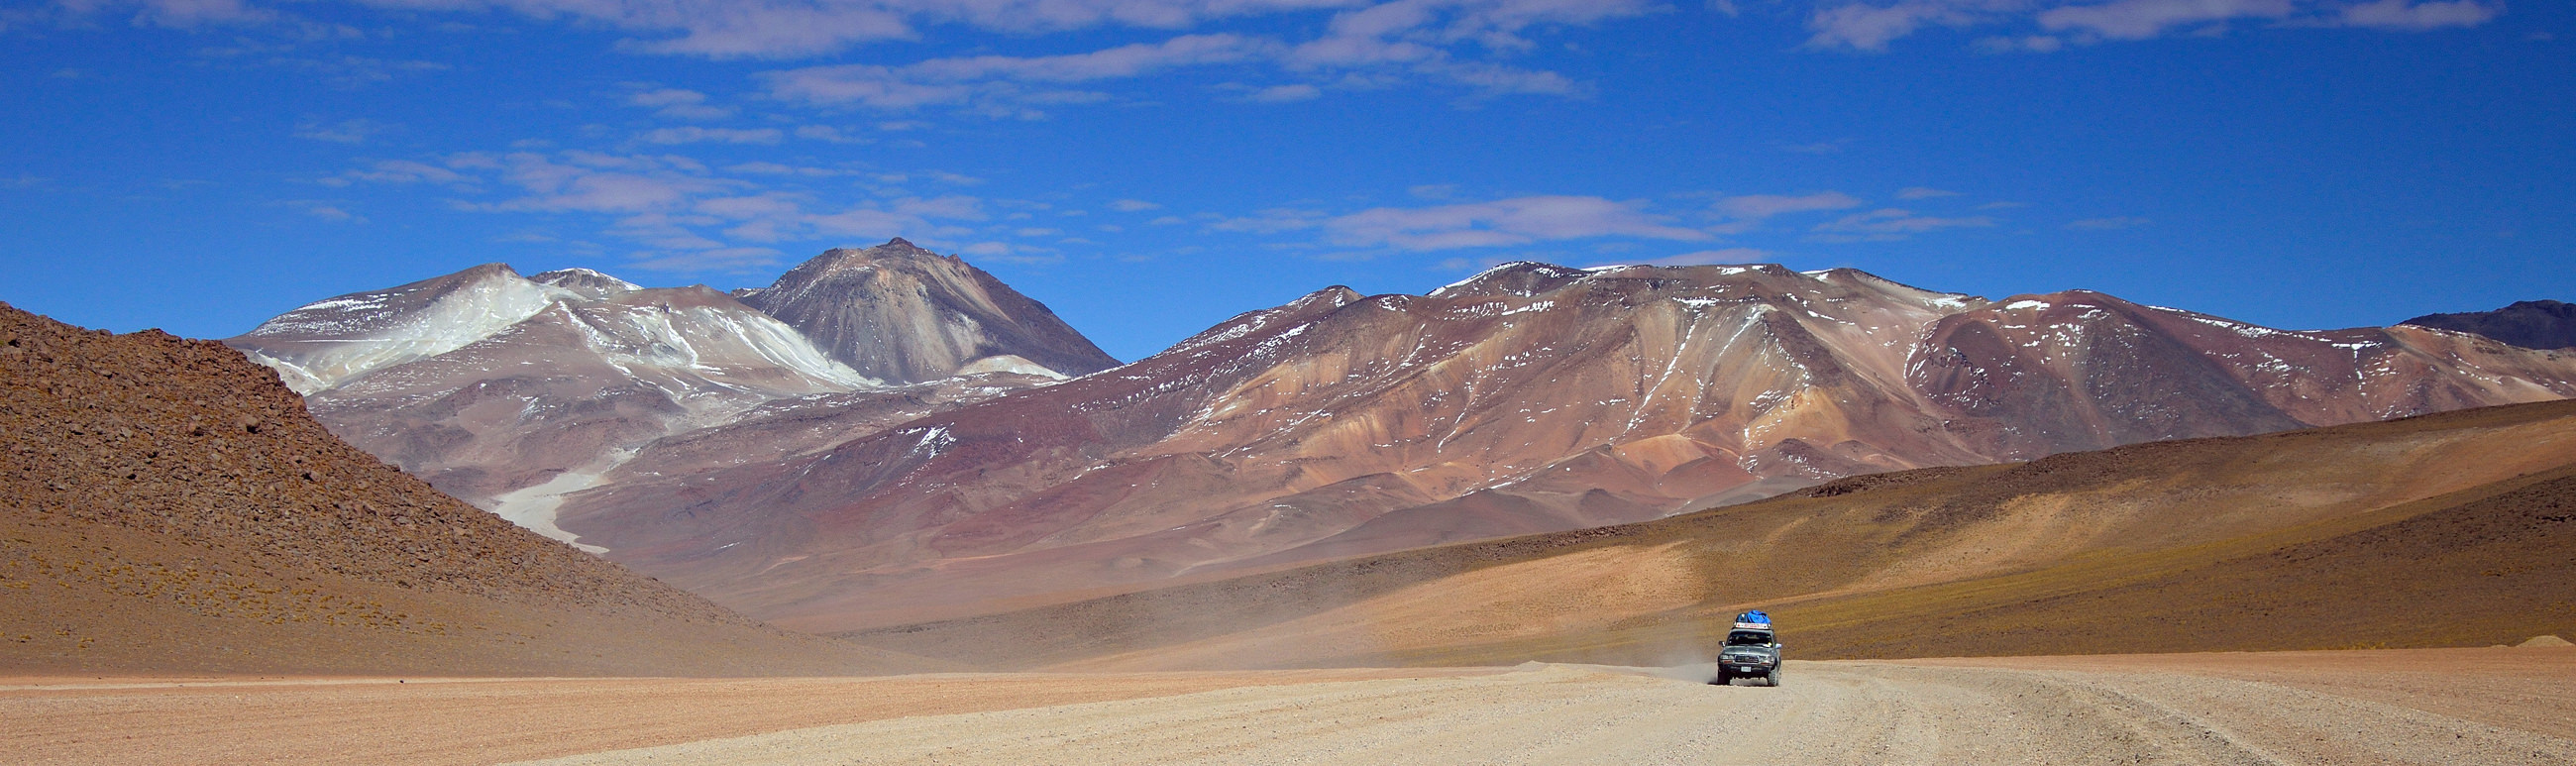 Inspiratie Altiplano Pano